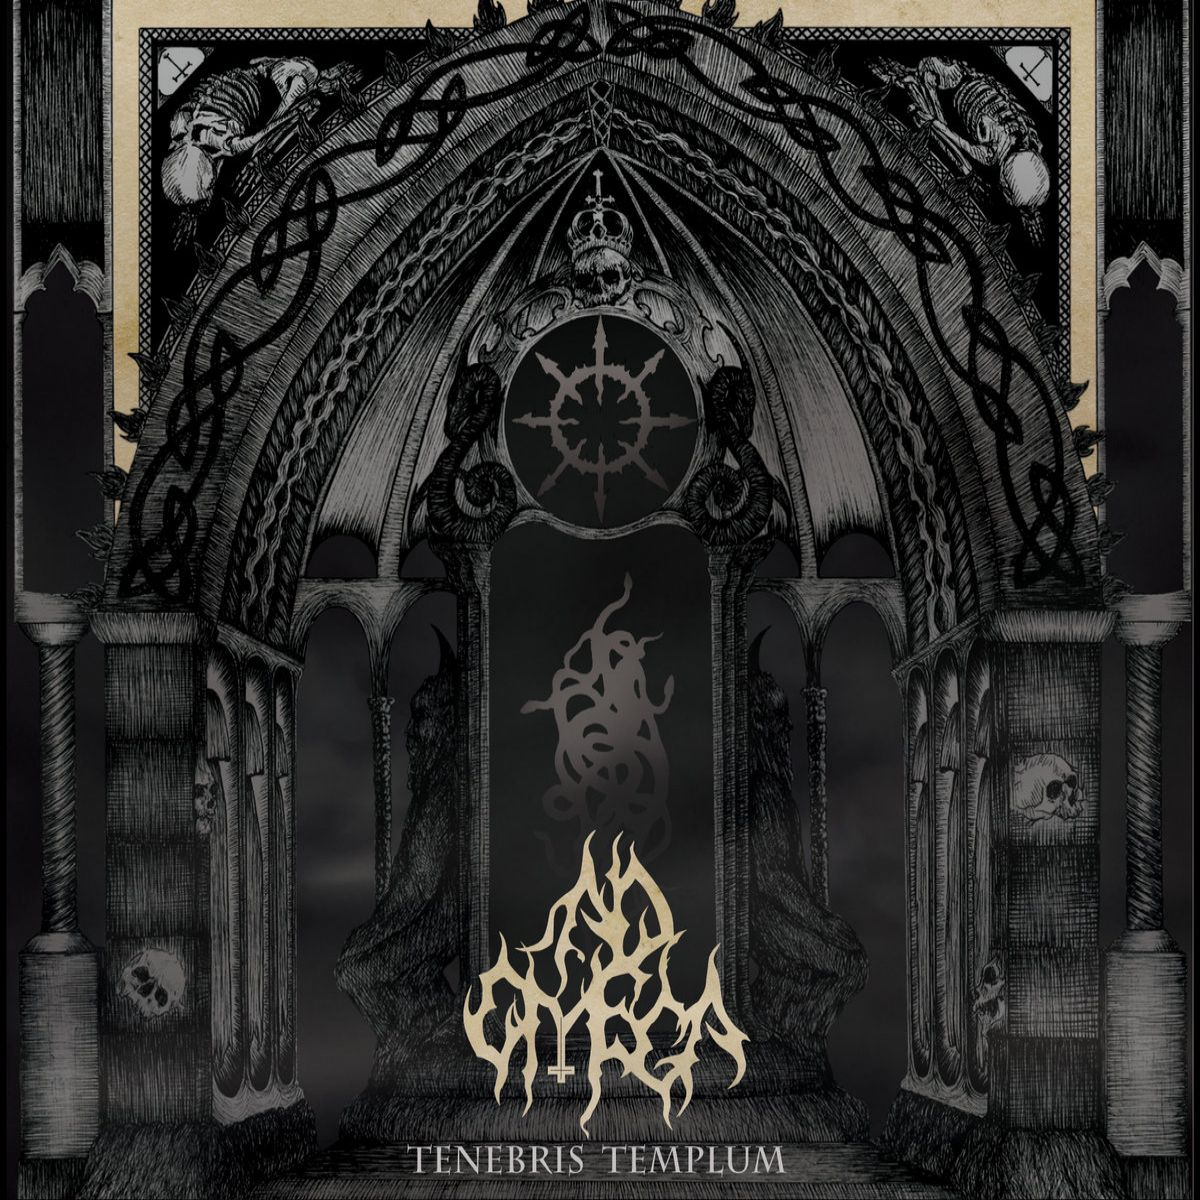 Review for Ad Omega - Tenebris Templum